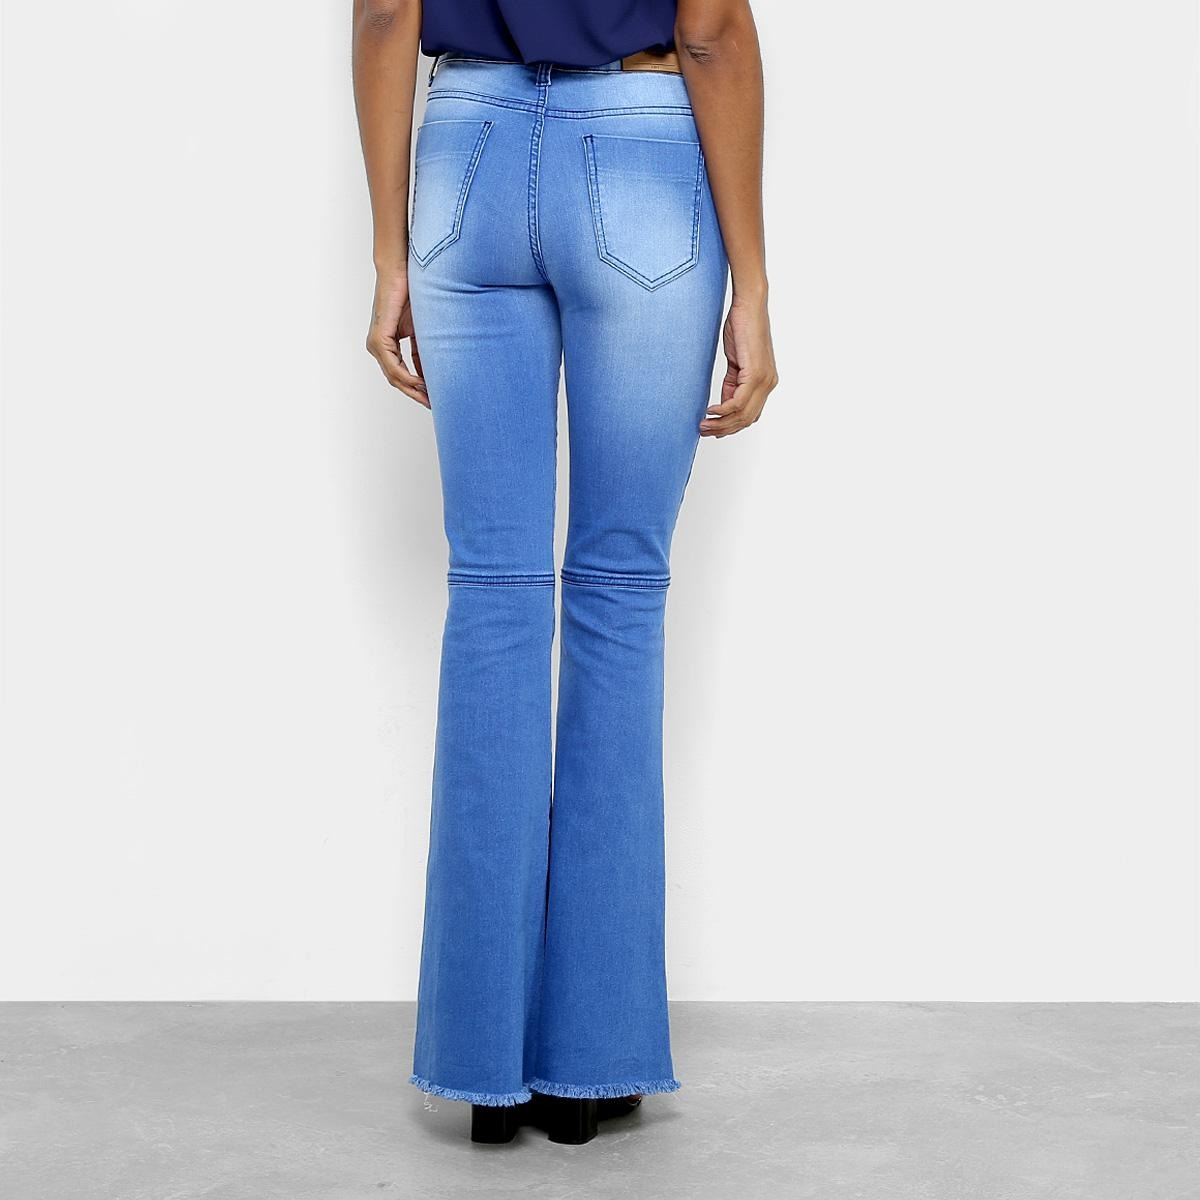 6b206f0bf calça jeans flare handbook tereza cintura alta feminina. Carregando zoom.